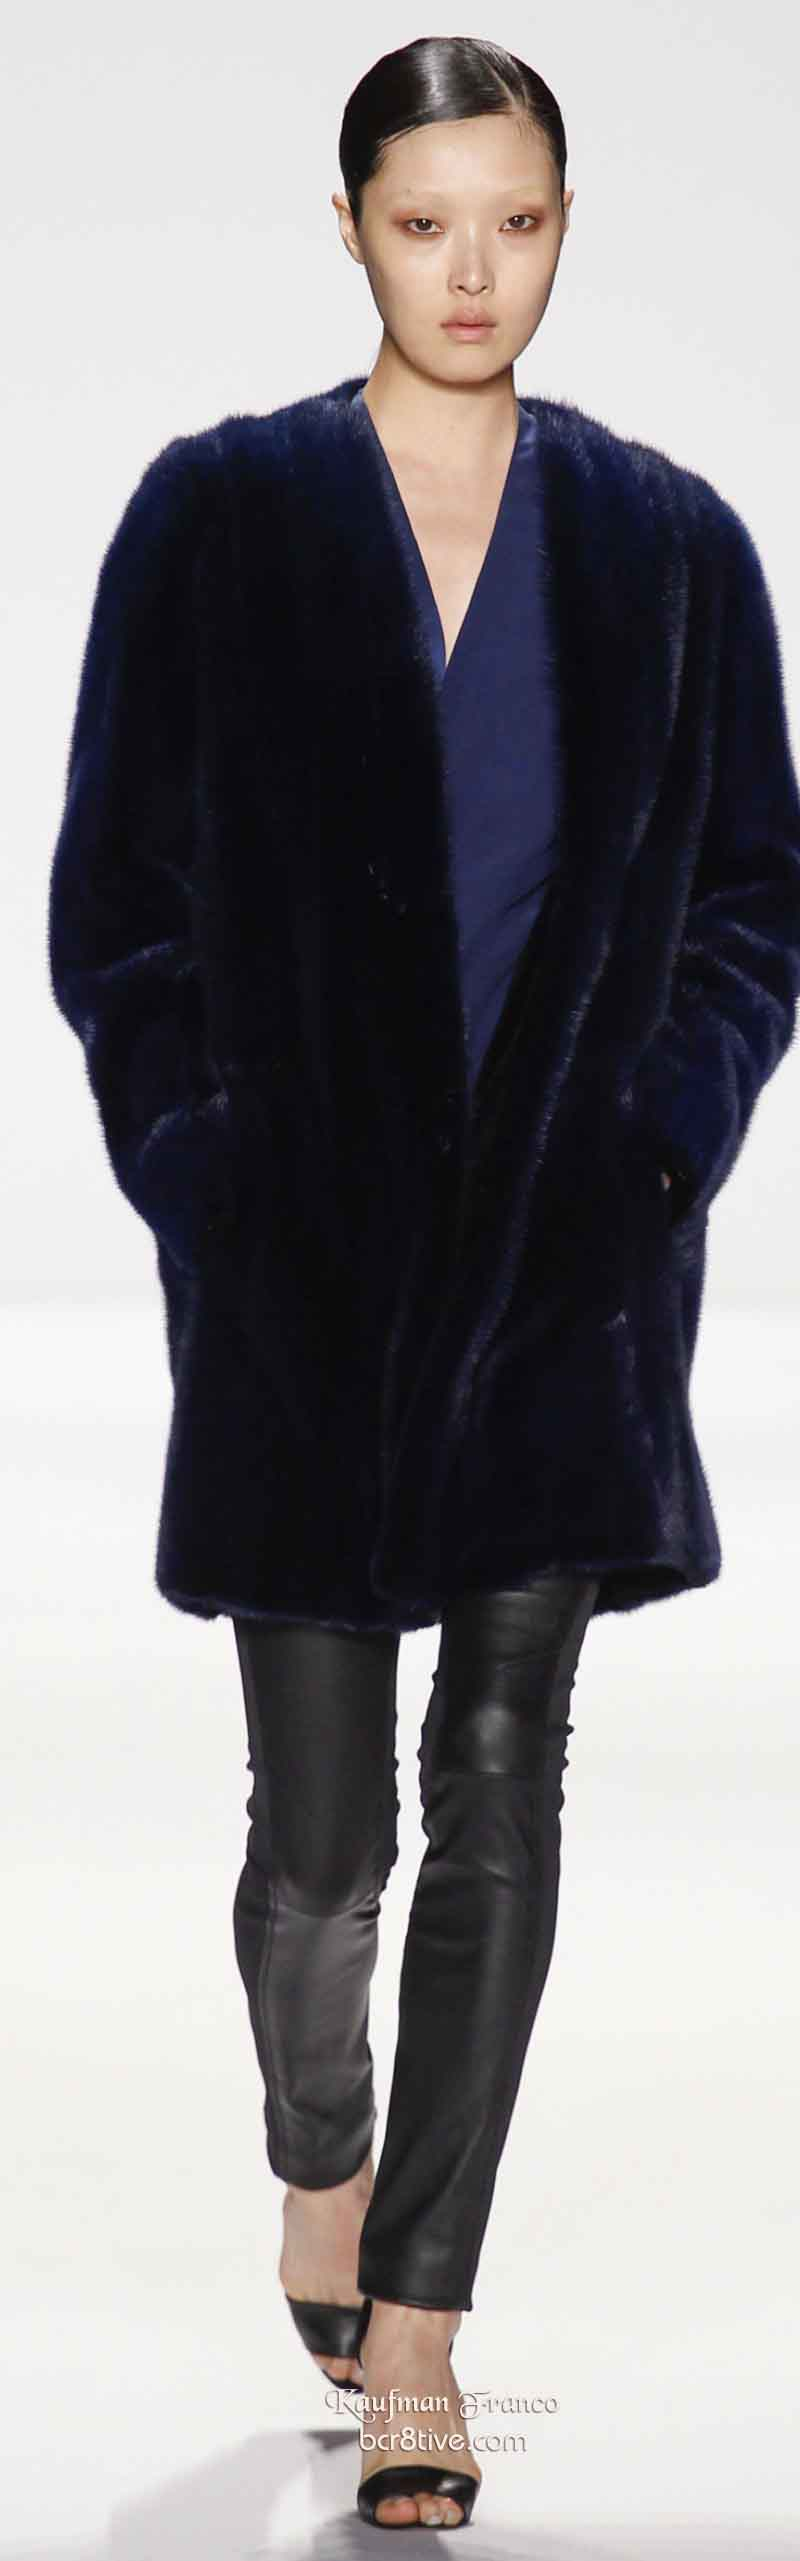 Kaufman Franco Fall Winter 2014-15 RTW